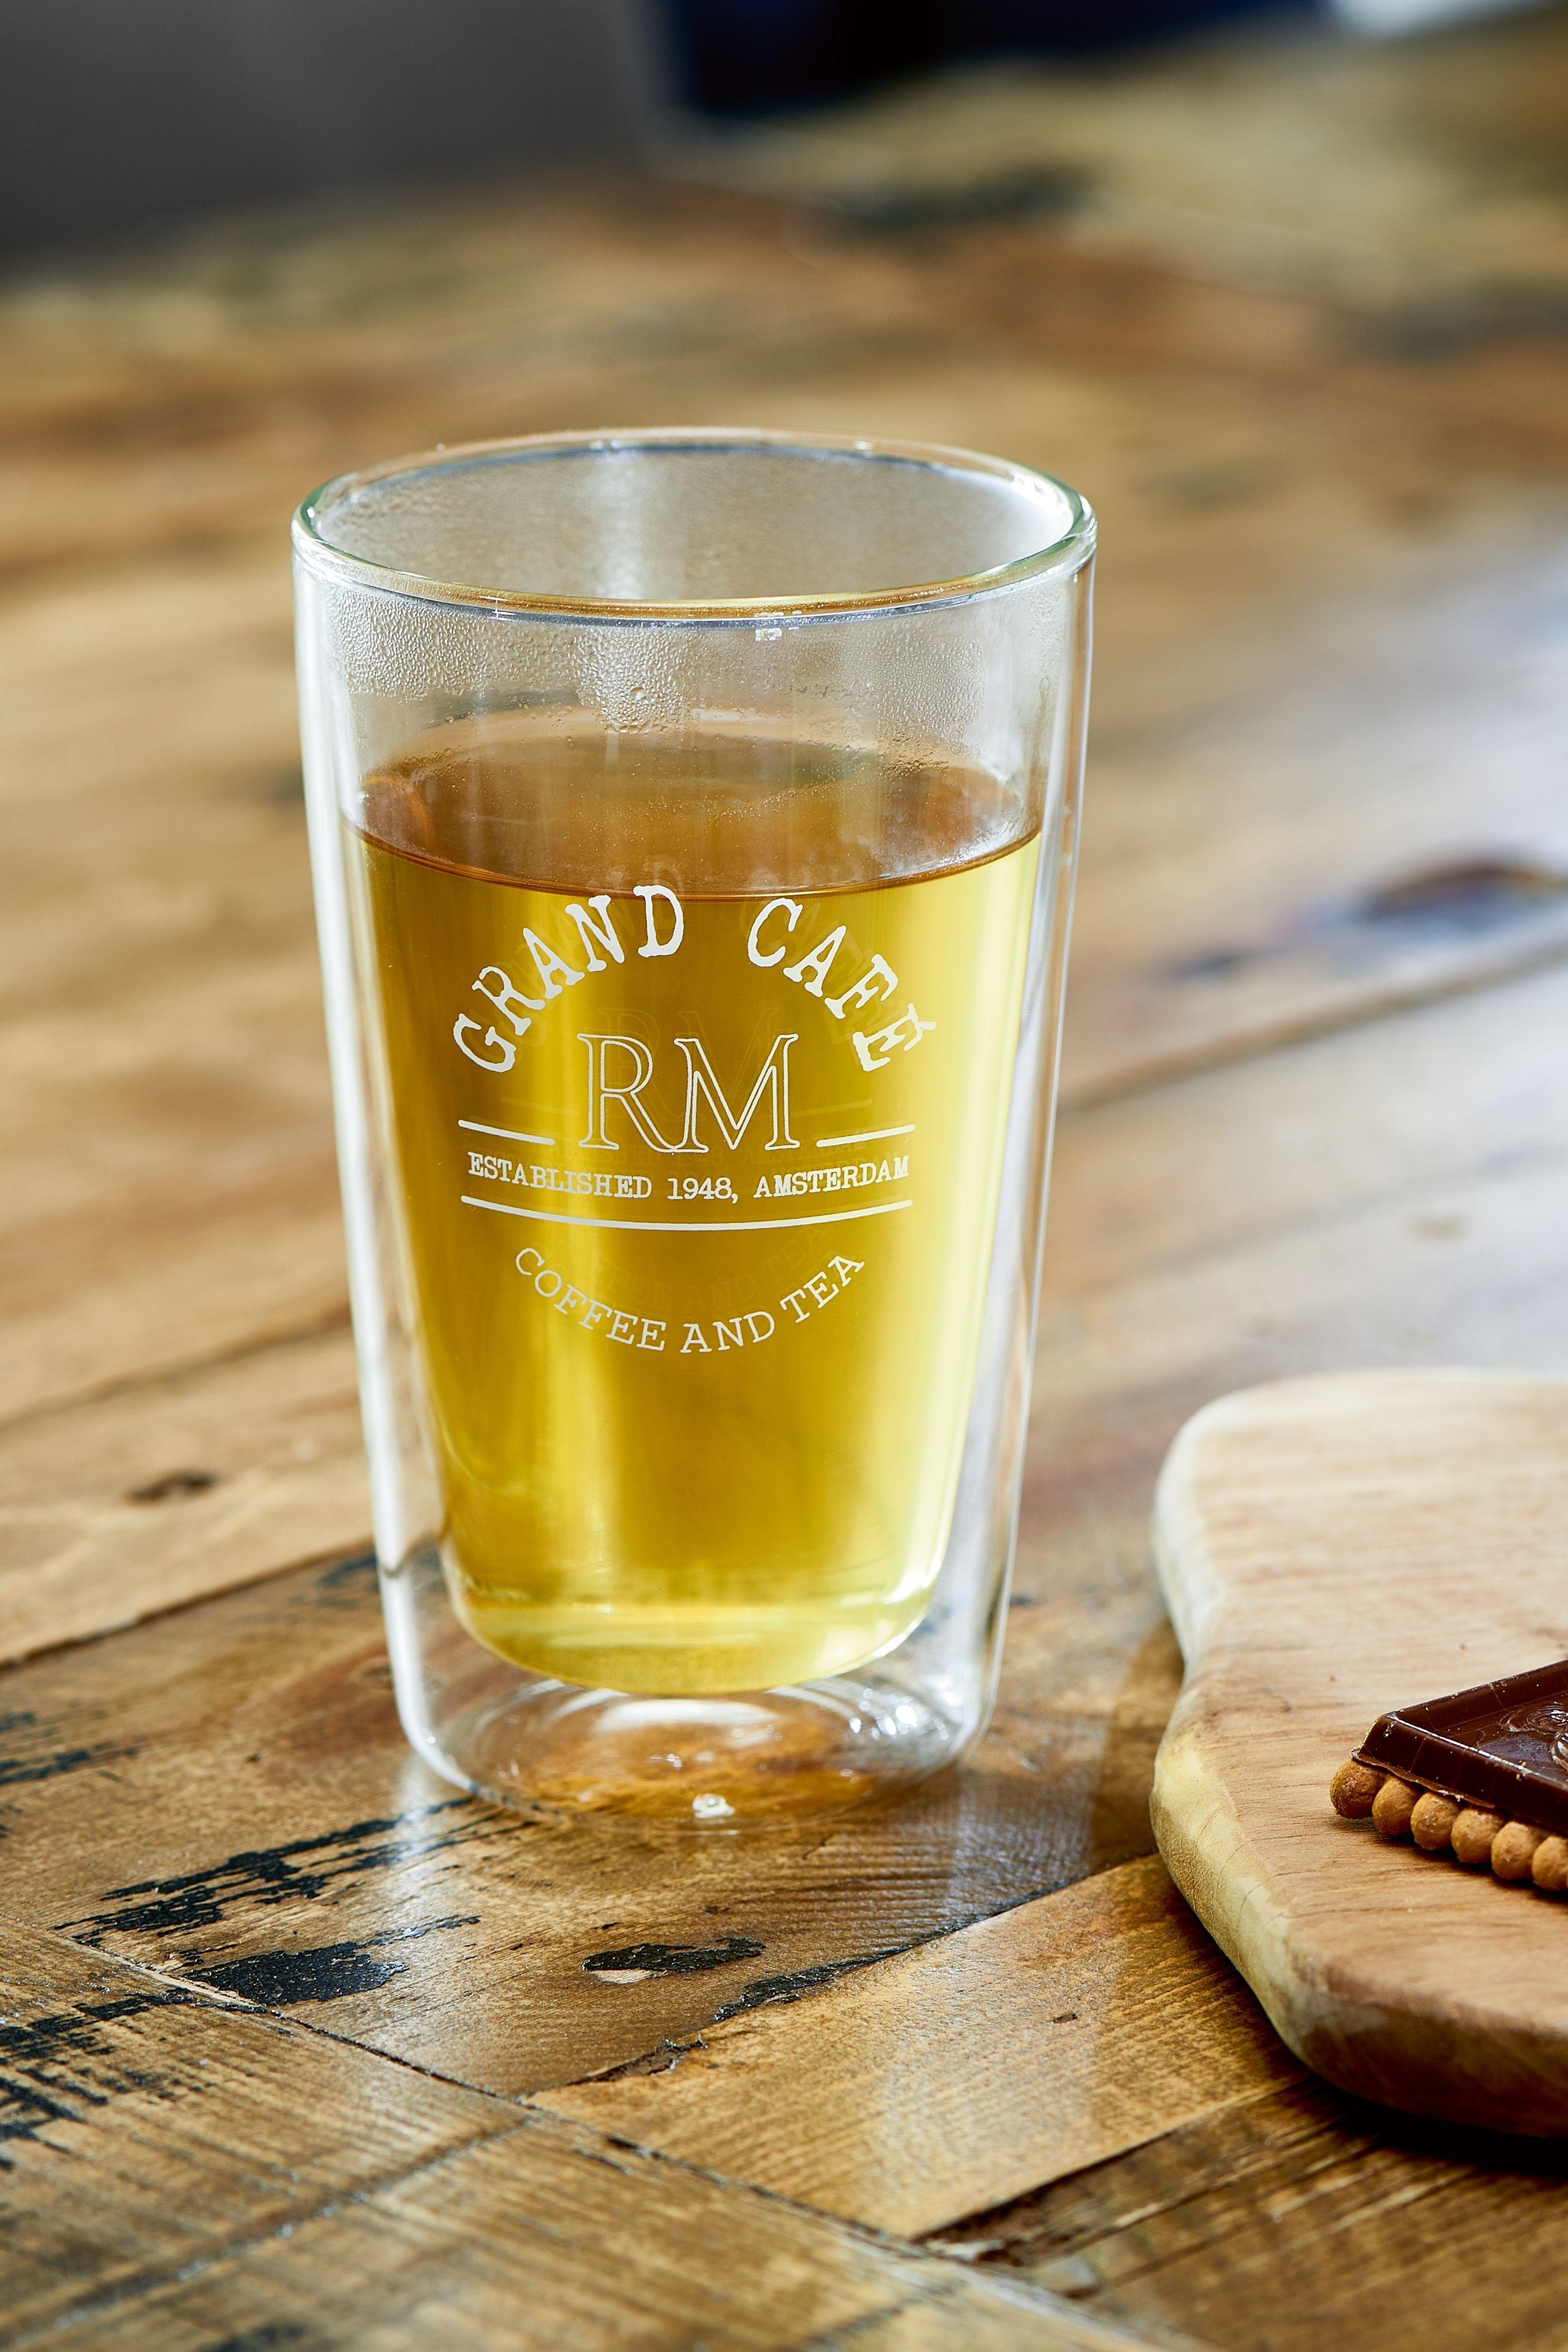 Sklenice Grand Café RM L